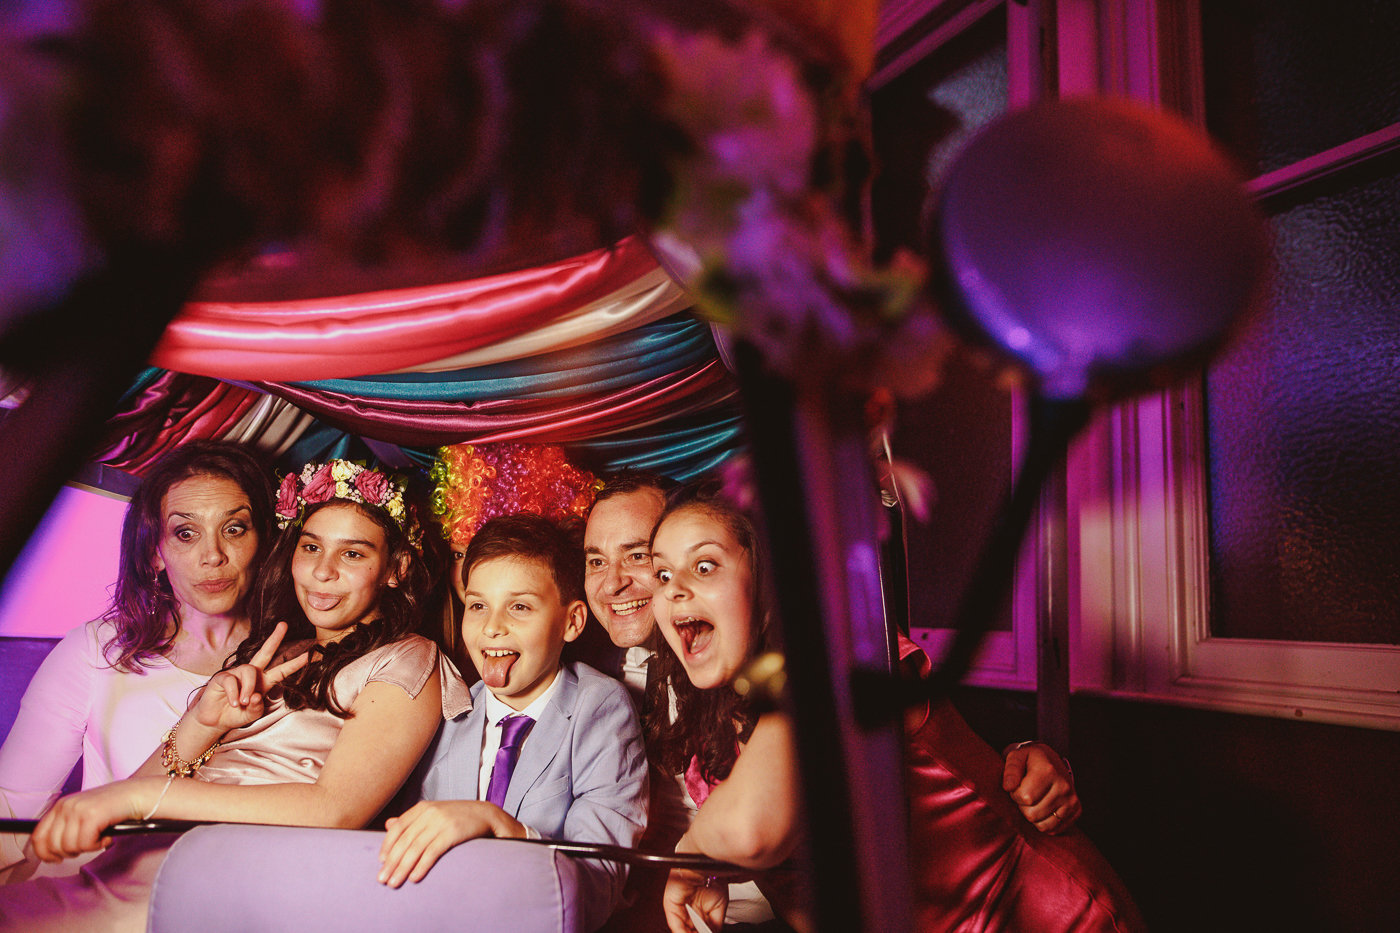 jewish-wedding-photographer-london-66.jpg